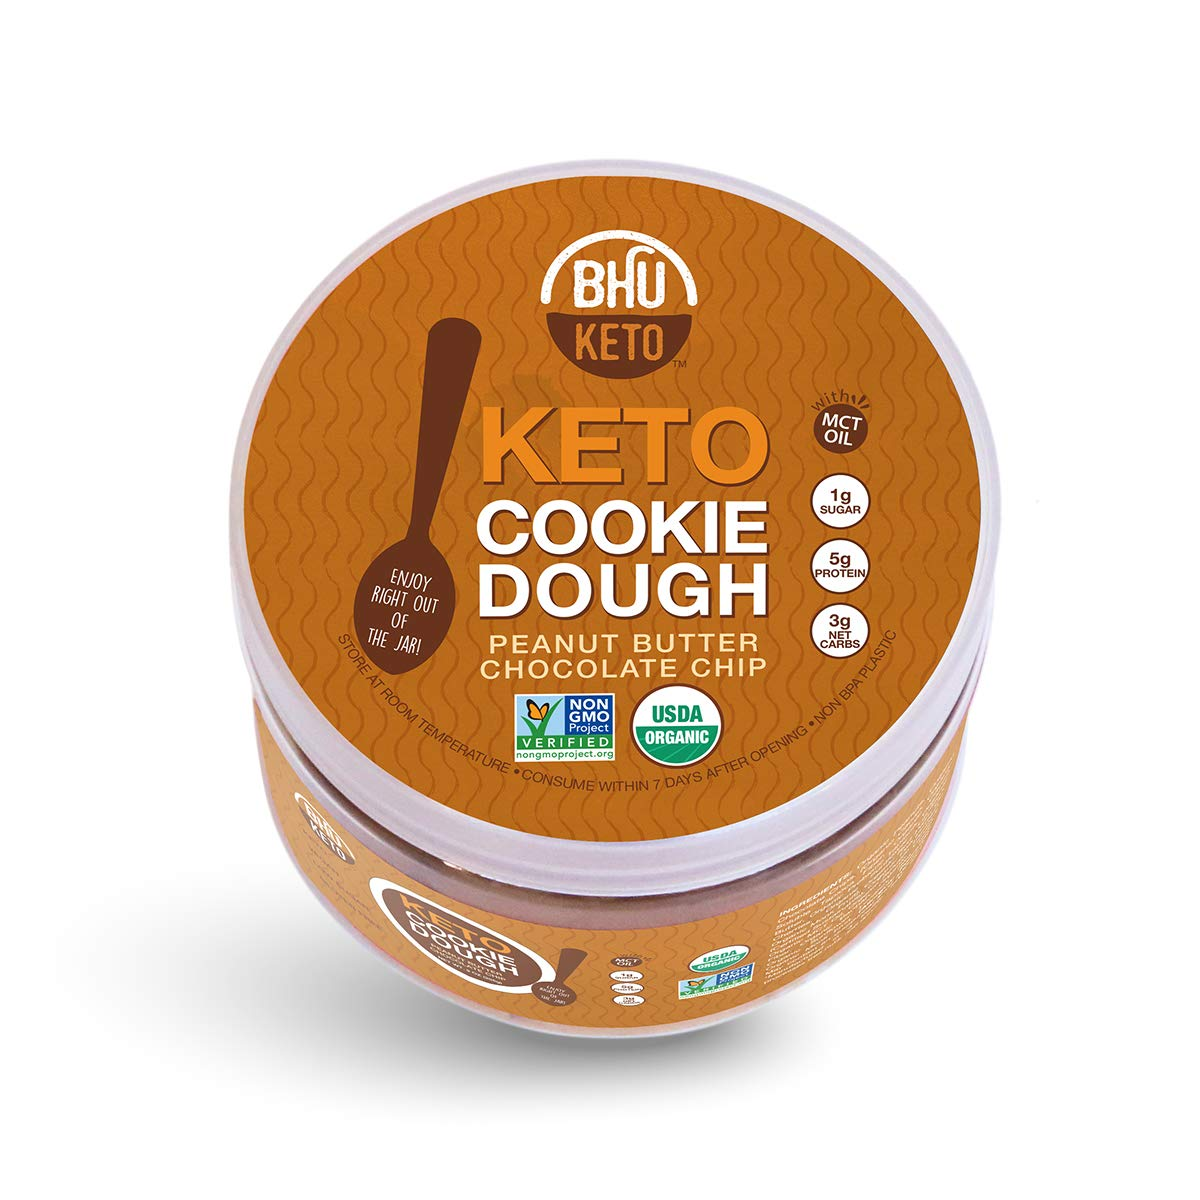 BHU Keto Protein Cookie Dough in a Jar, Peanut Butter Chocolate Chip - Organic & Vegan Snack - Clean Ingredient Dessert which are Low Carb & Low Sugar, Grain & Gluten Free, Dairy-Free, Non-GMO (9 oz)